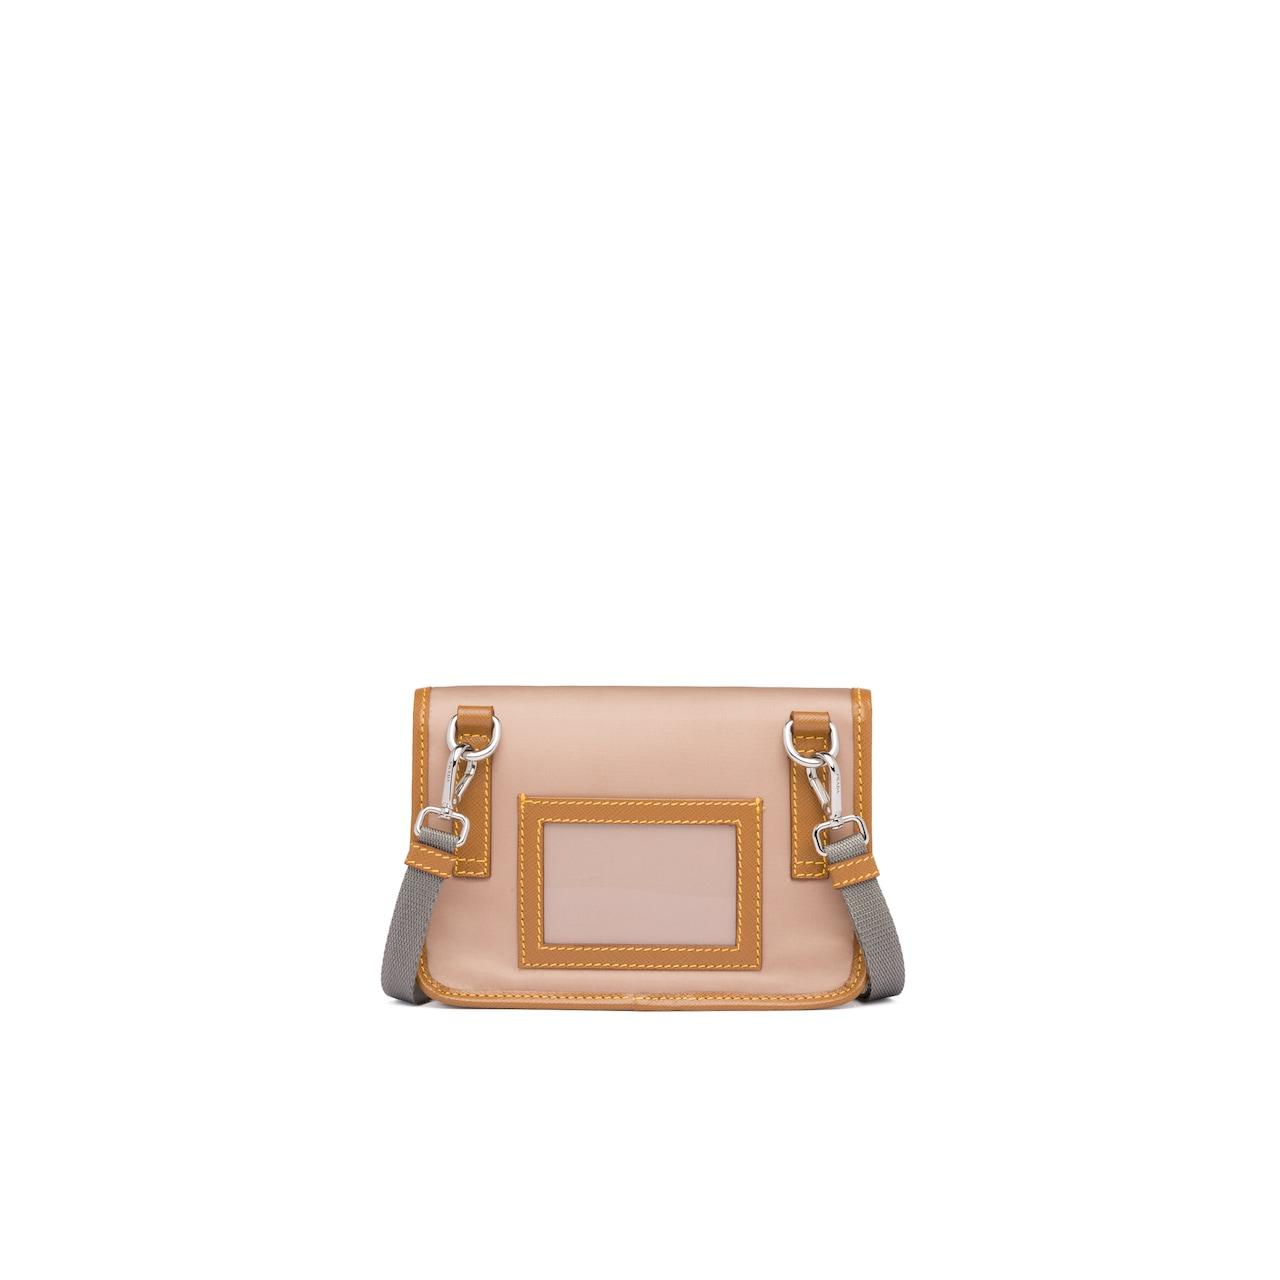 Prada Nylon and Saffiano cellphone case with shoulder strap 3